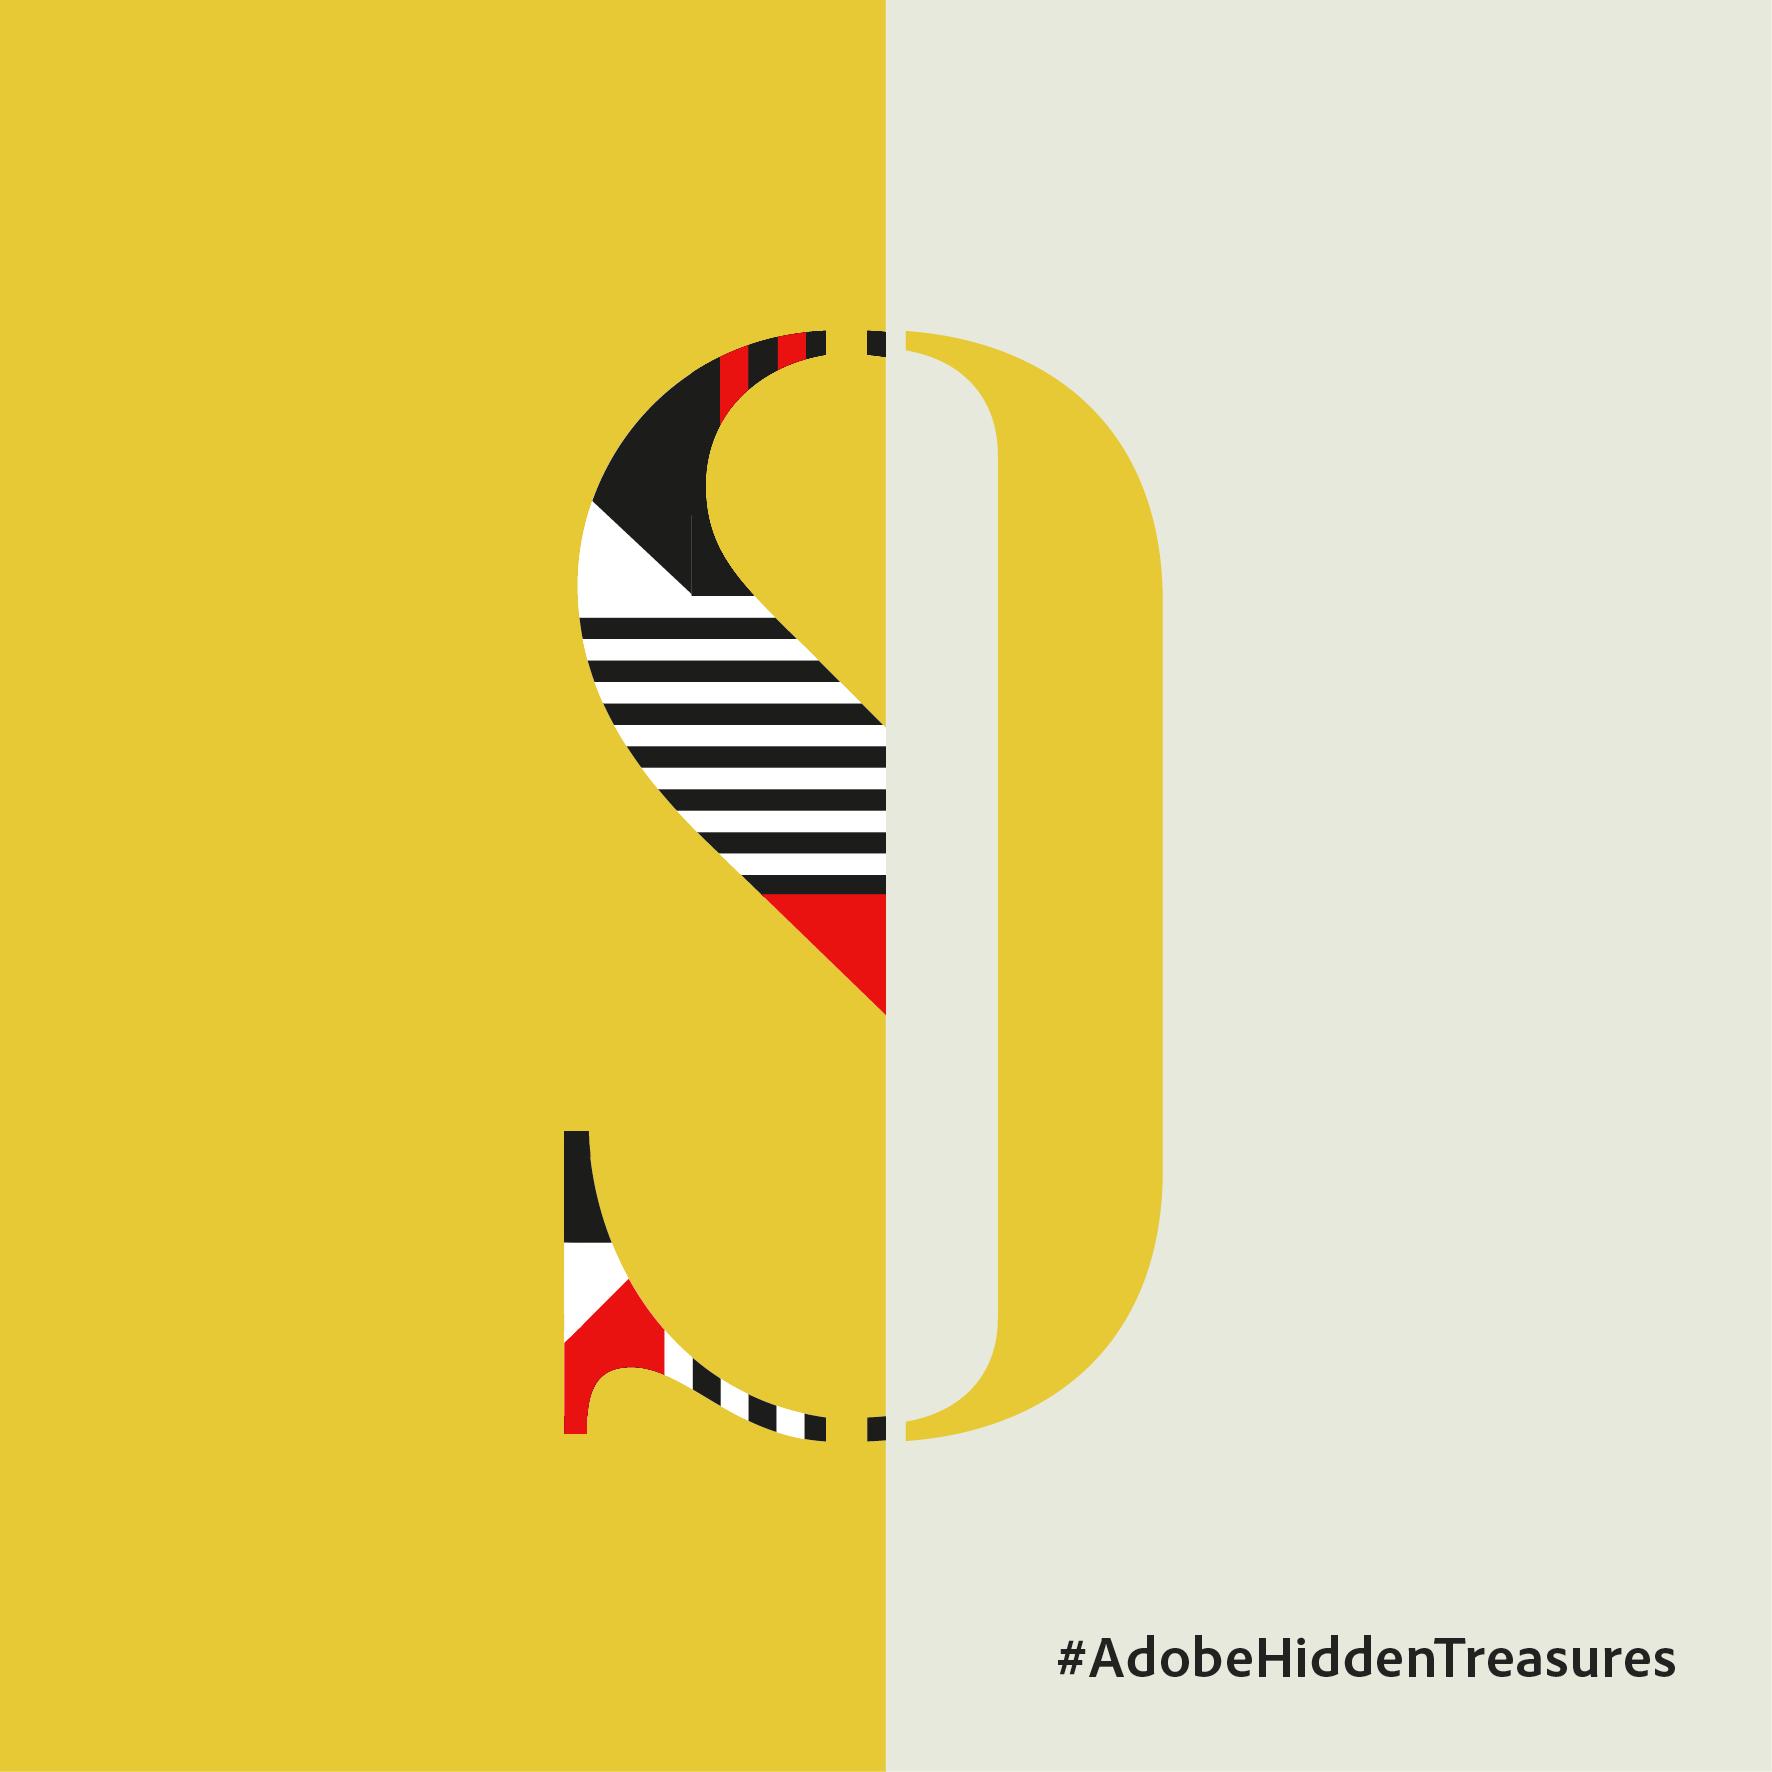 C2_Adobe-HiddenTreasures-Palma-Typejockeys_MaxMustermann1.png